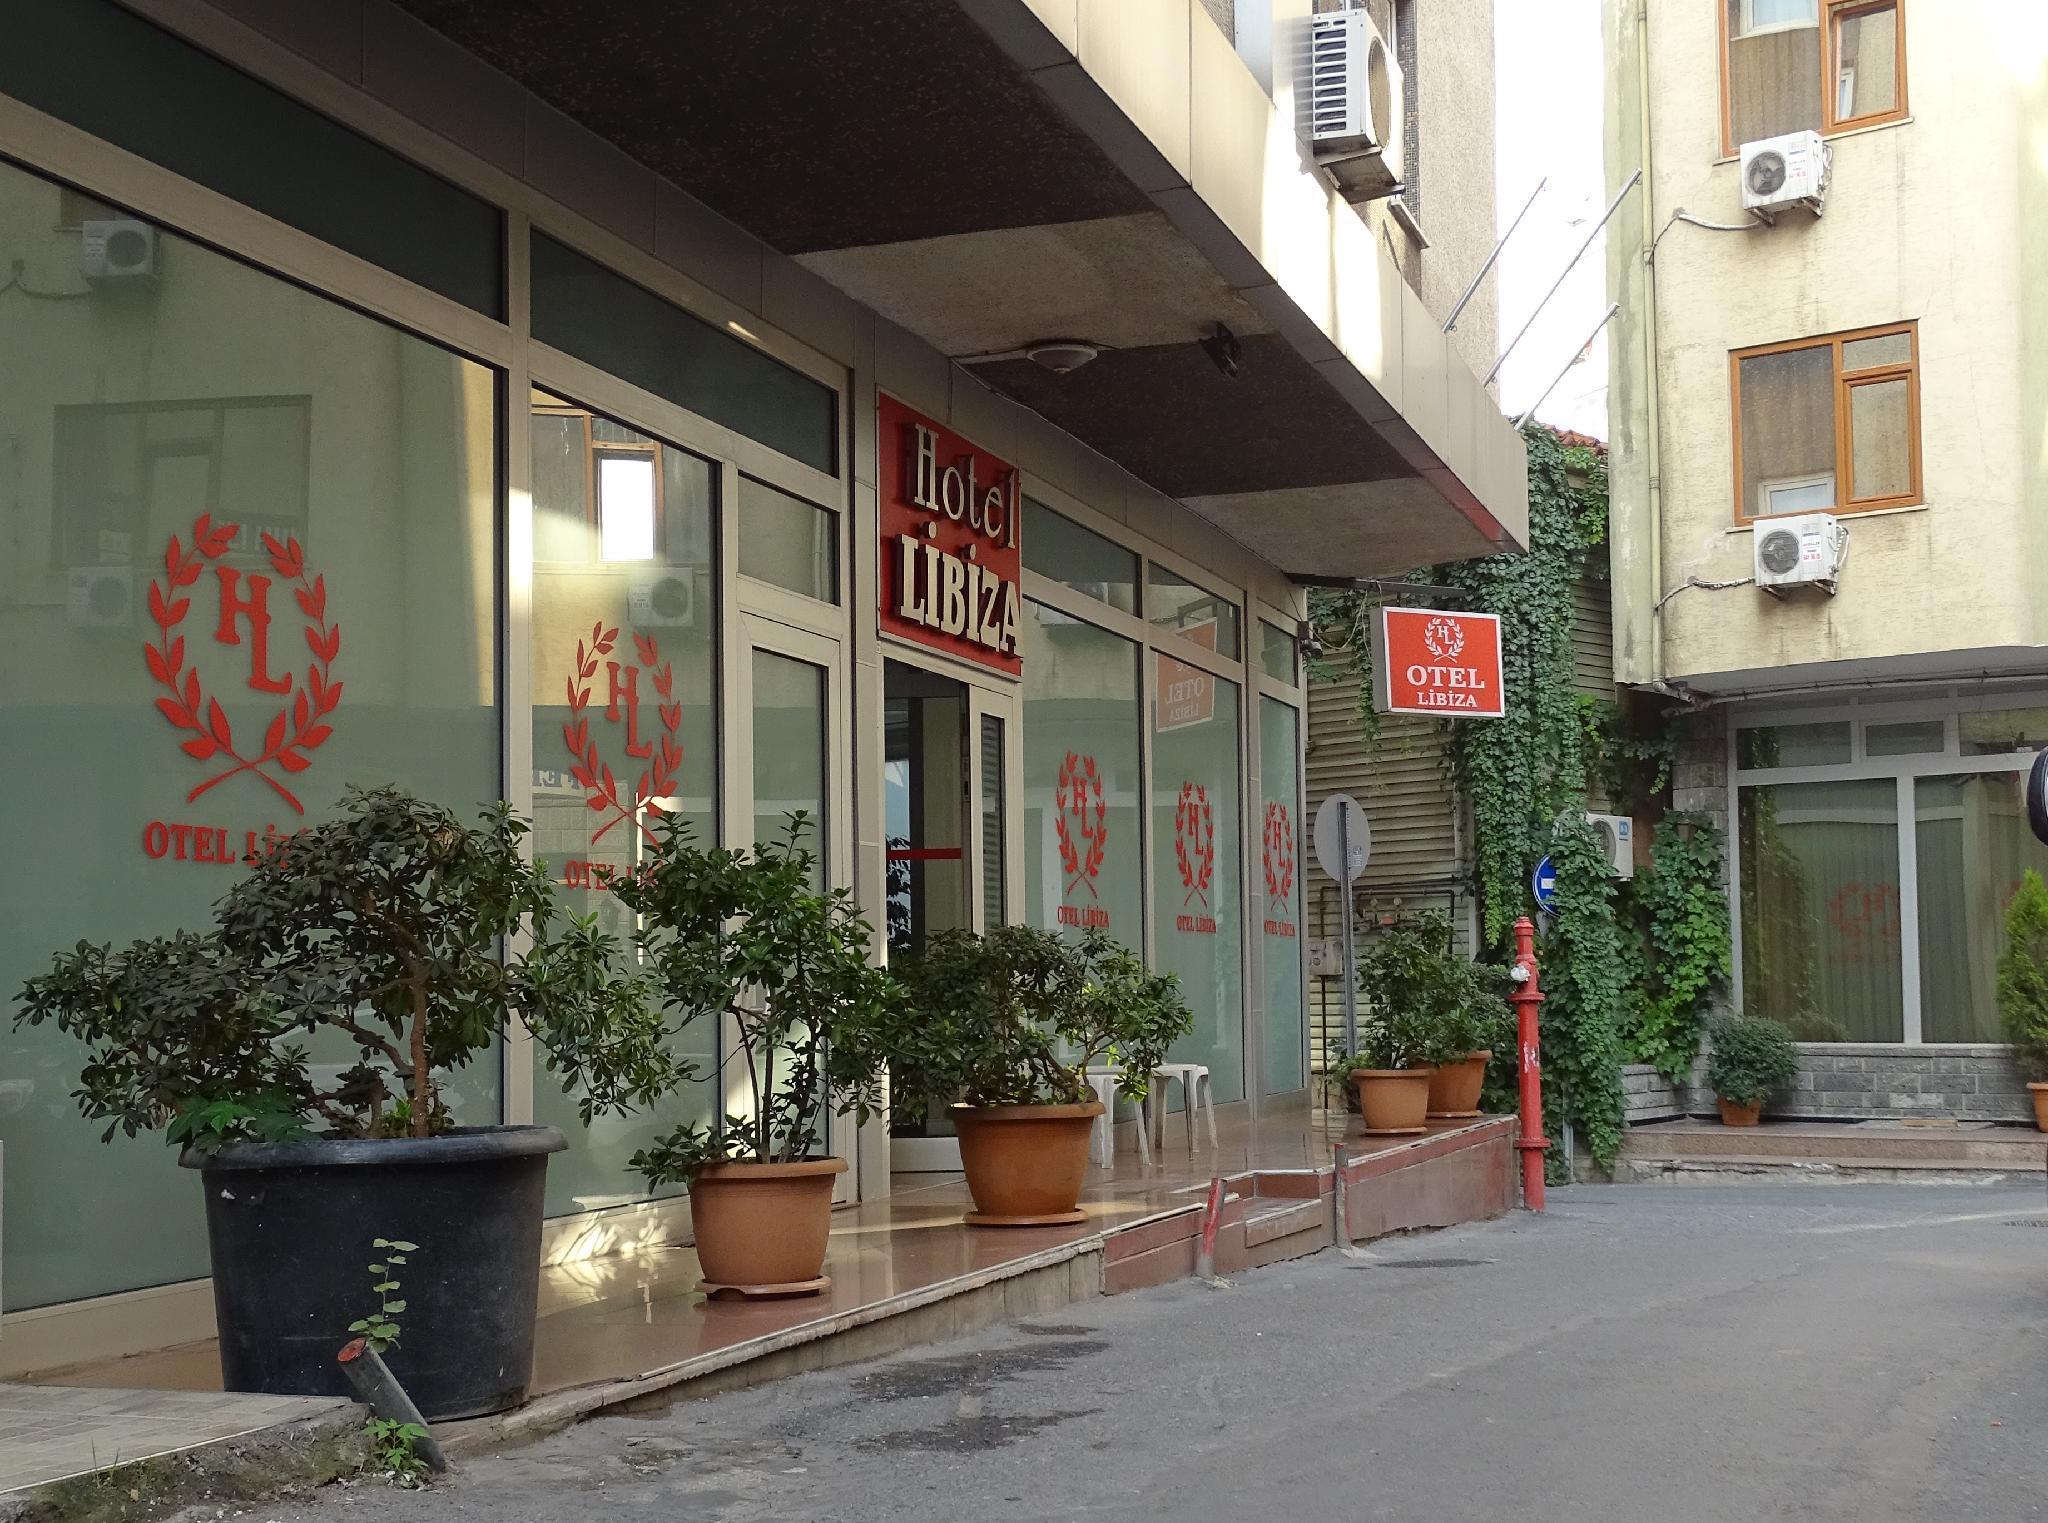 Hotel Libiza